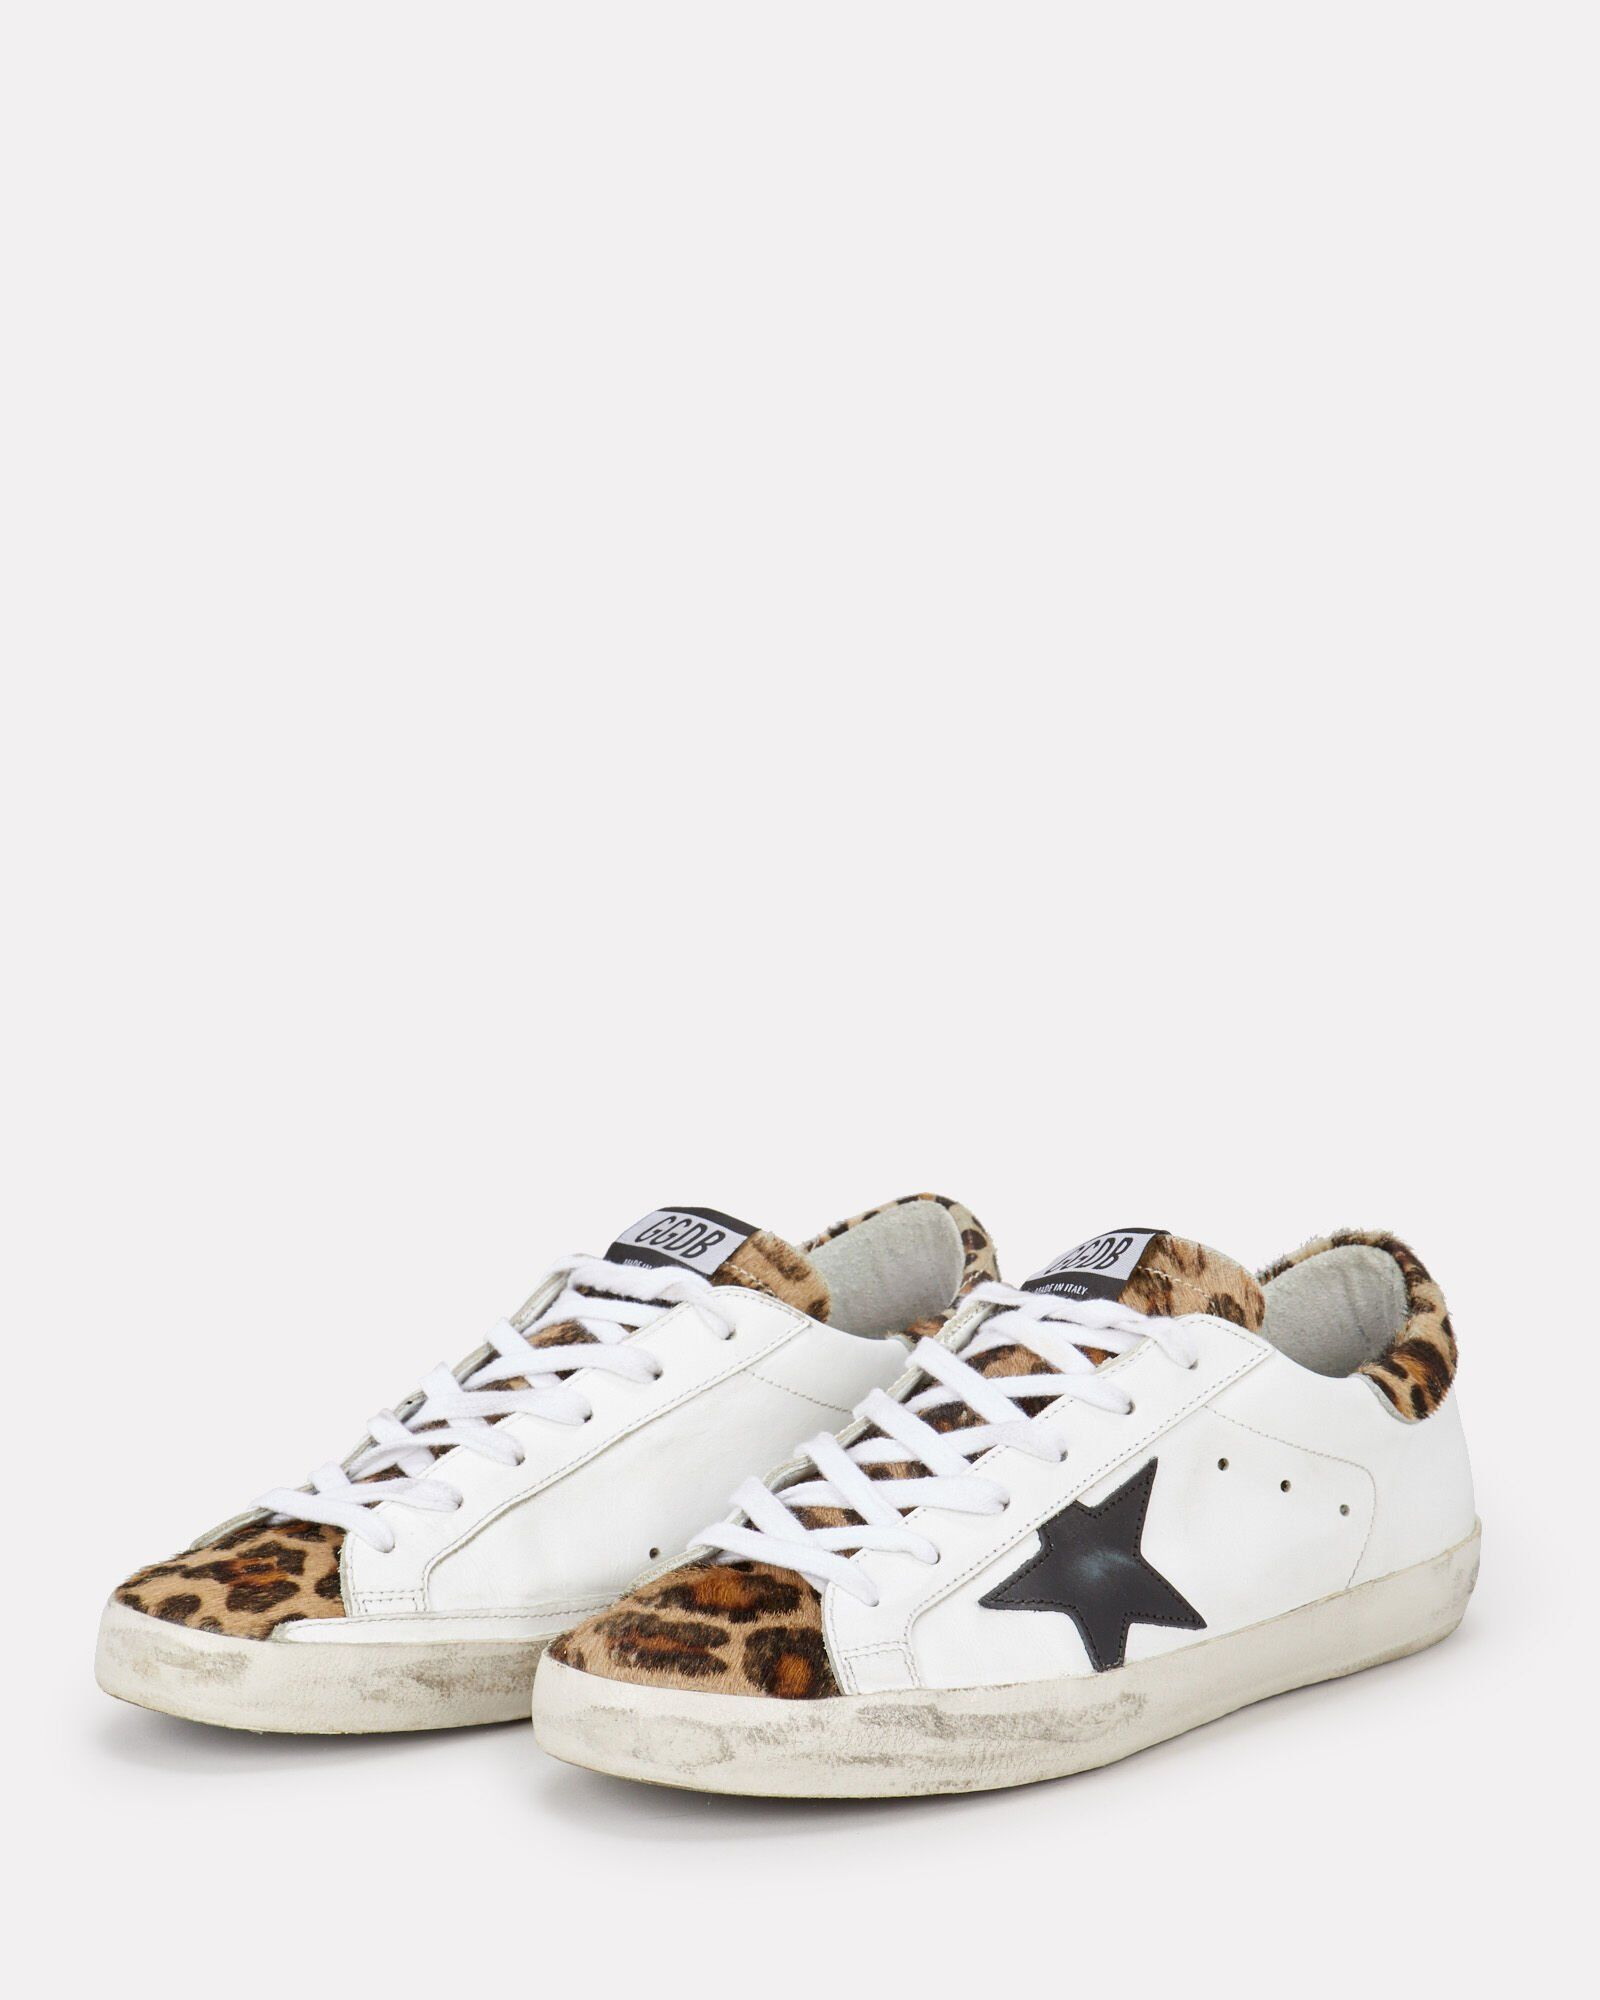 adidas originals superstar trainers with leopard print trim